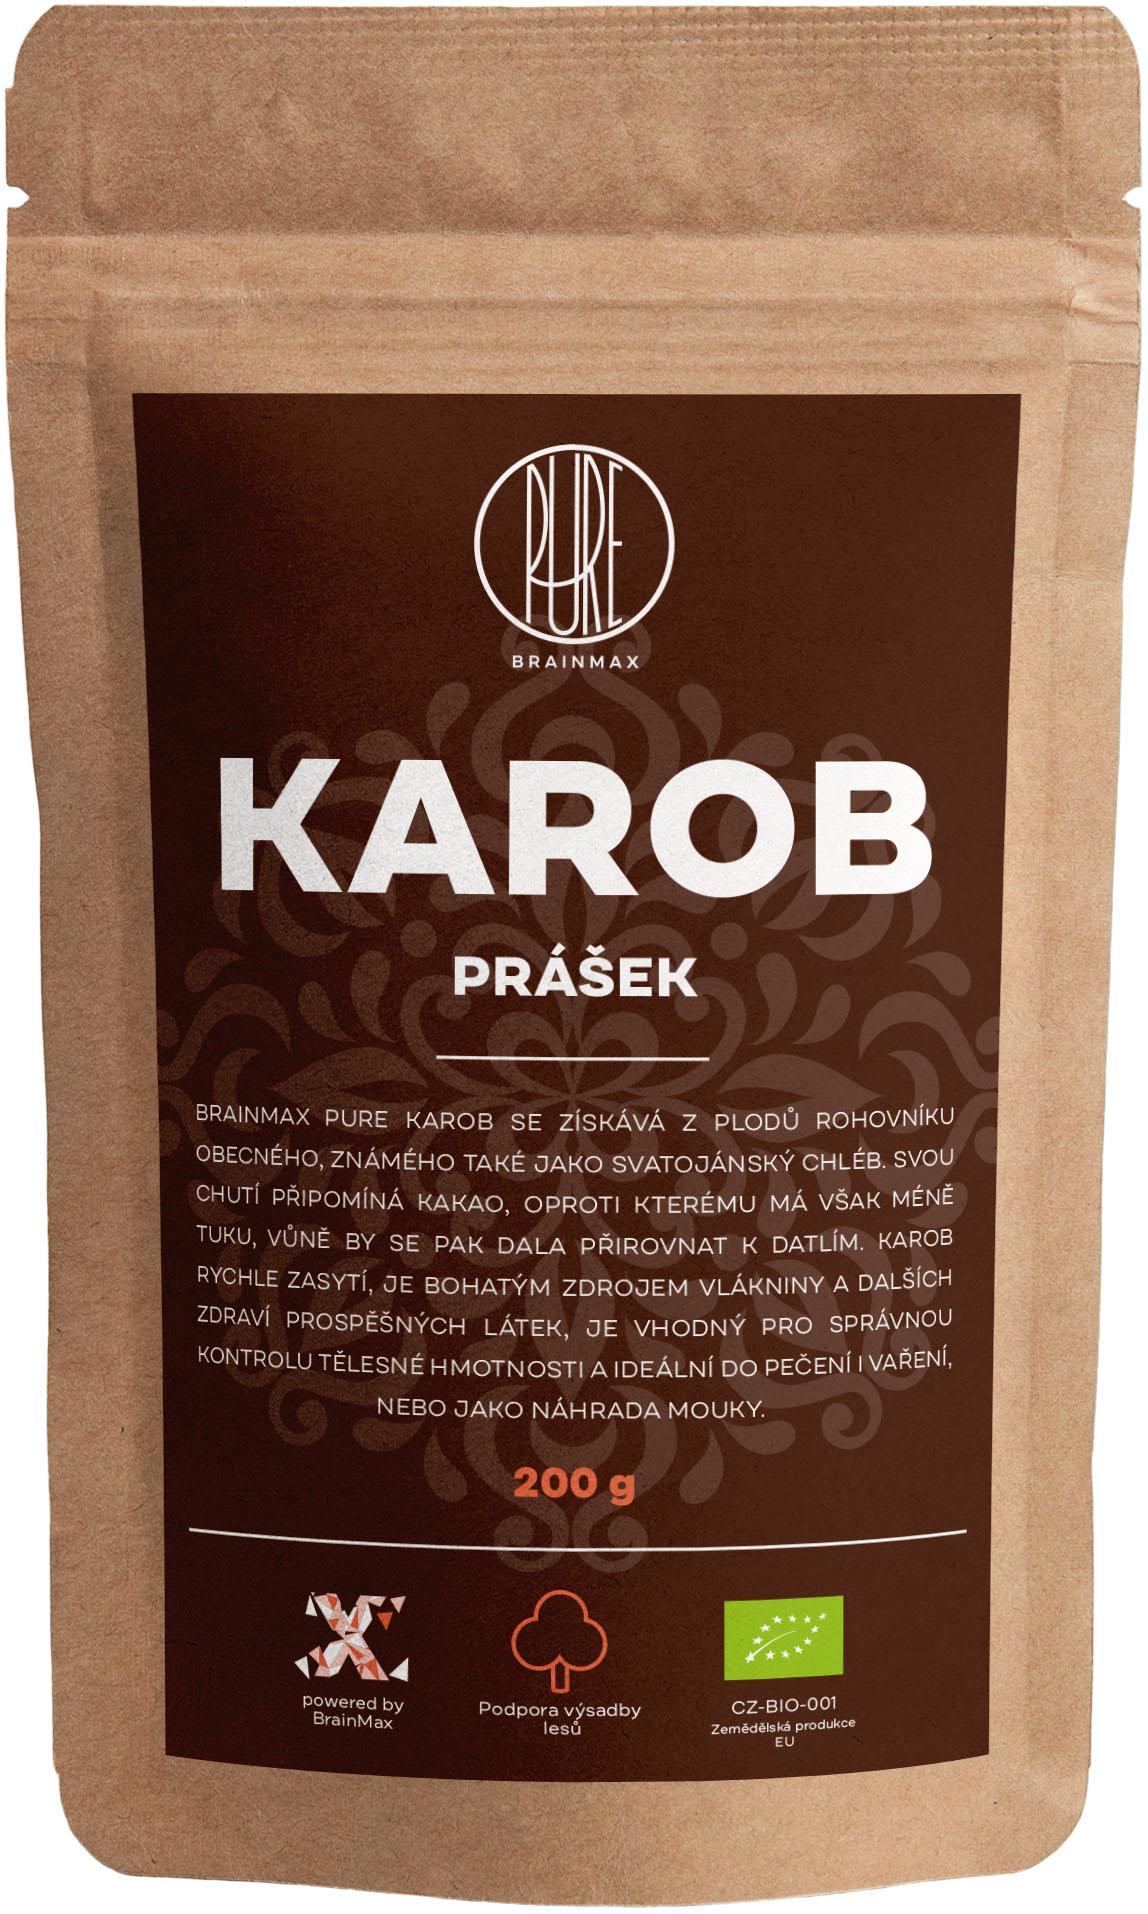 BrainMax Pure Carob (Karob) BIO, 200 g *CZ-BIO-001 certifikát